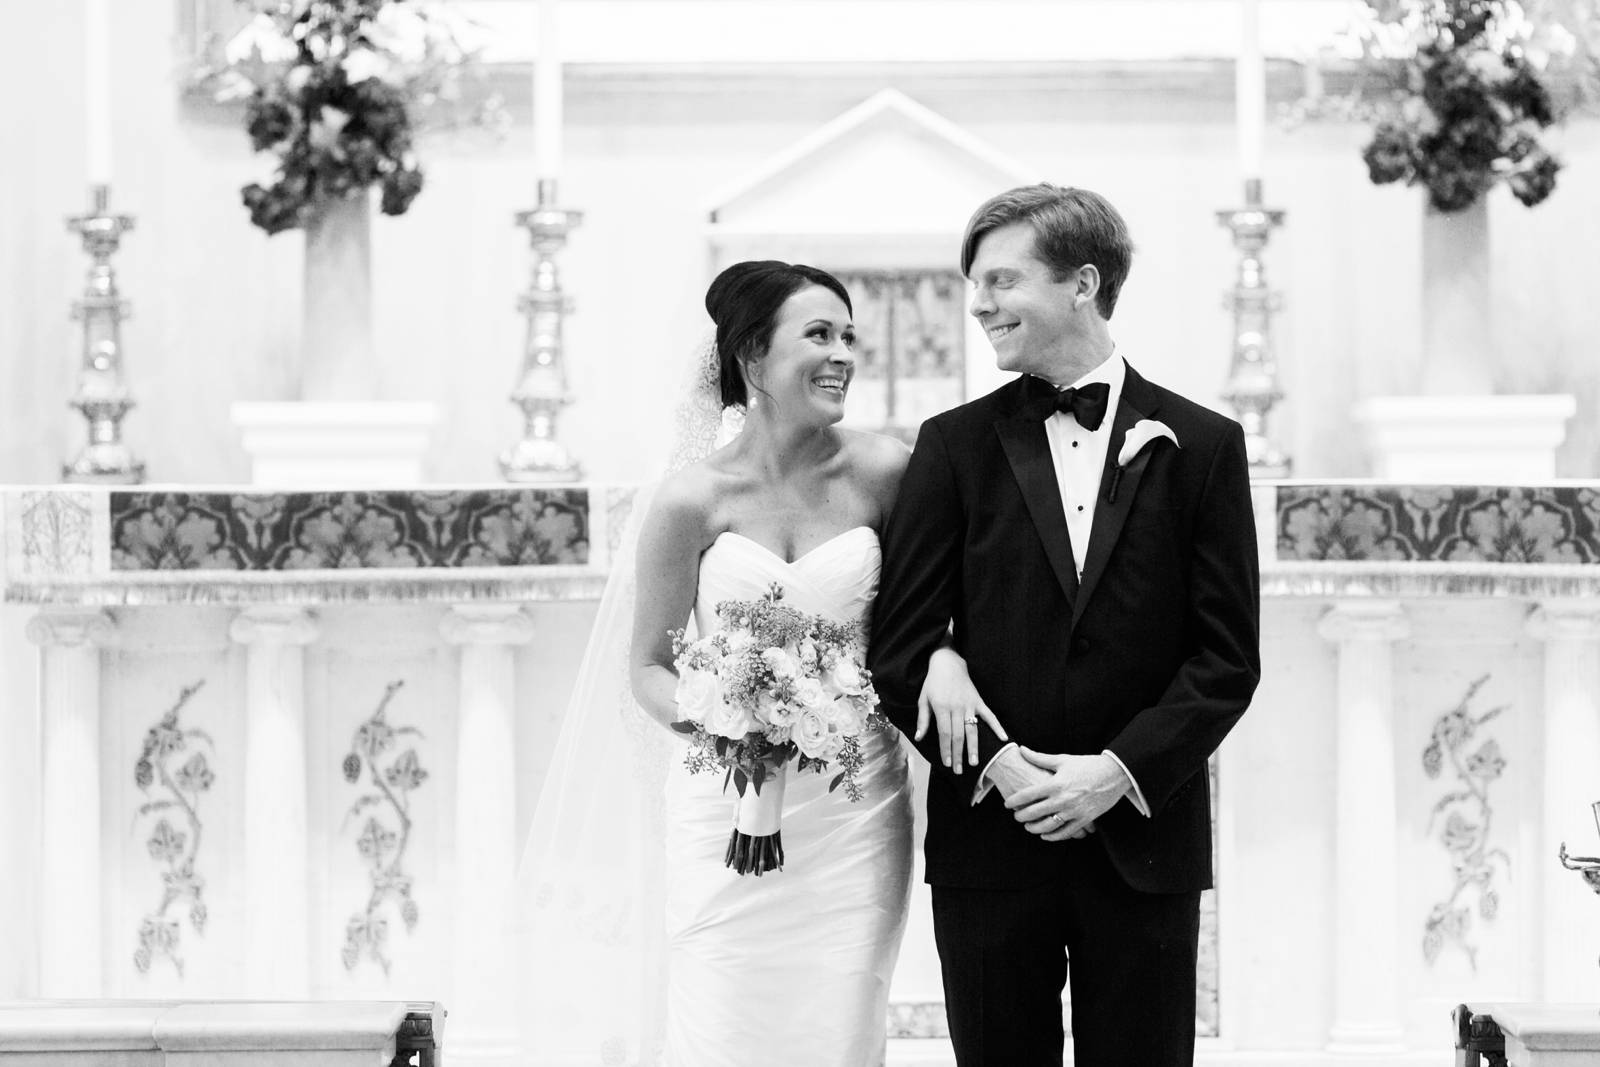 atrium at curtis center wedding photographer philadelphia wedding photographer shannon griffin_0009.jpg